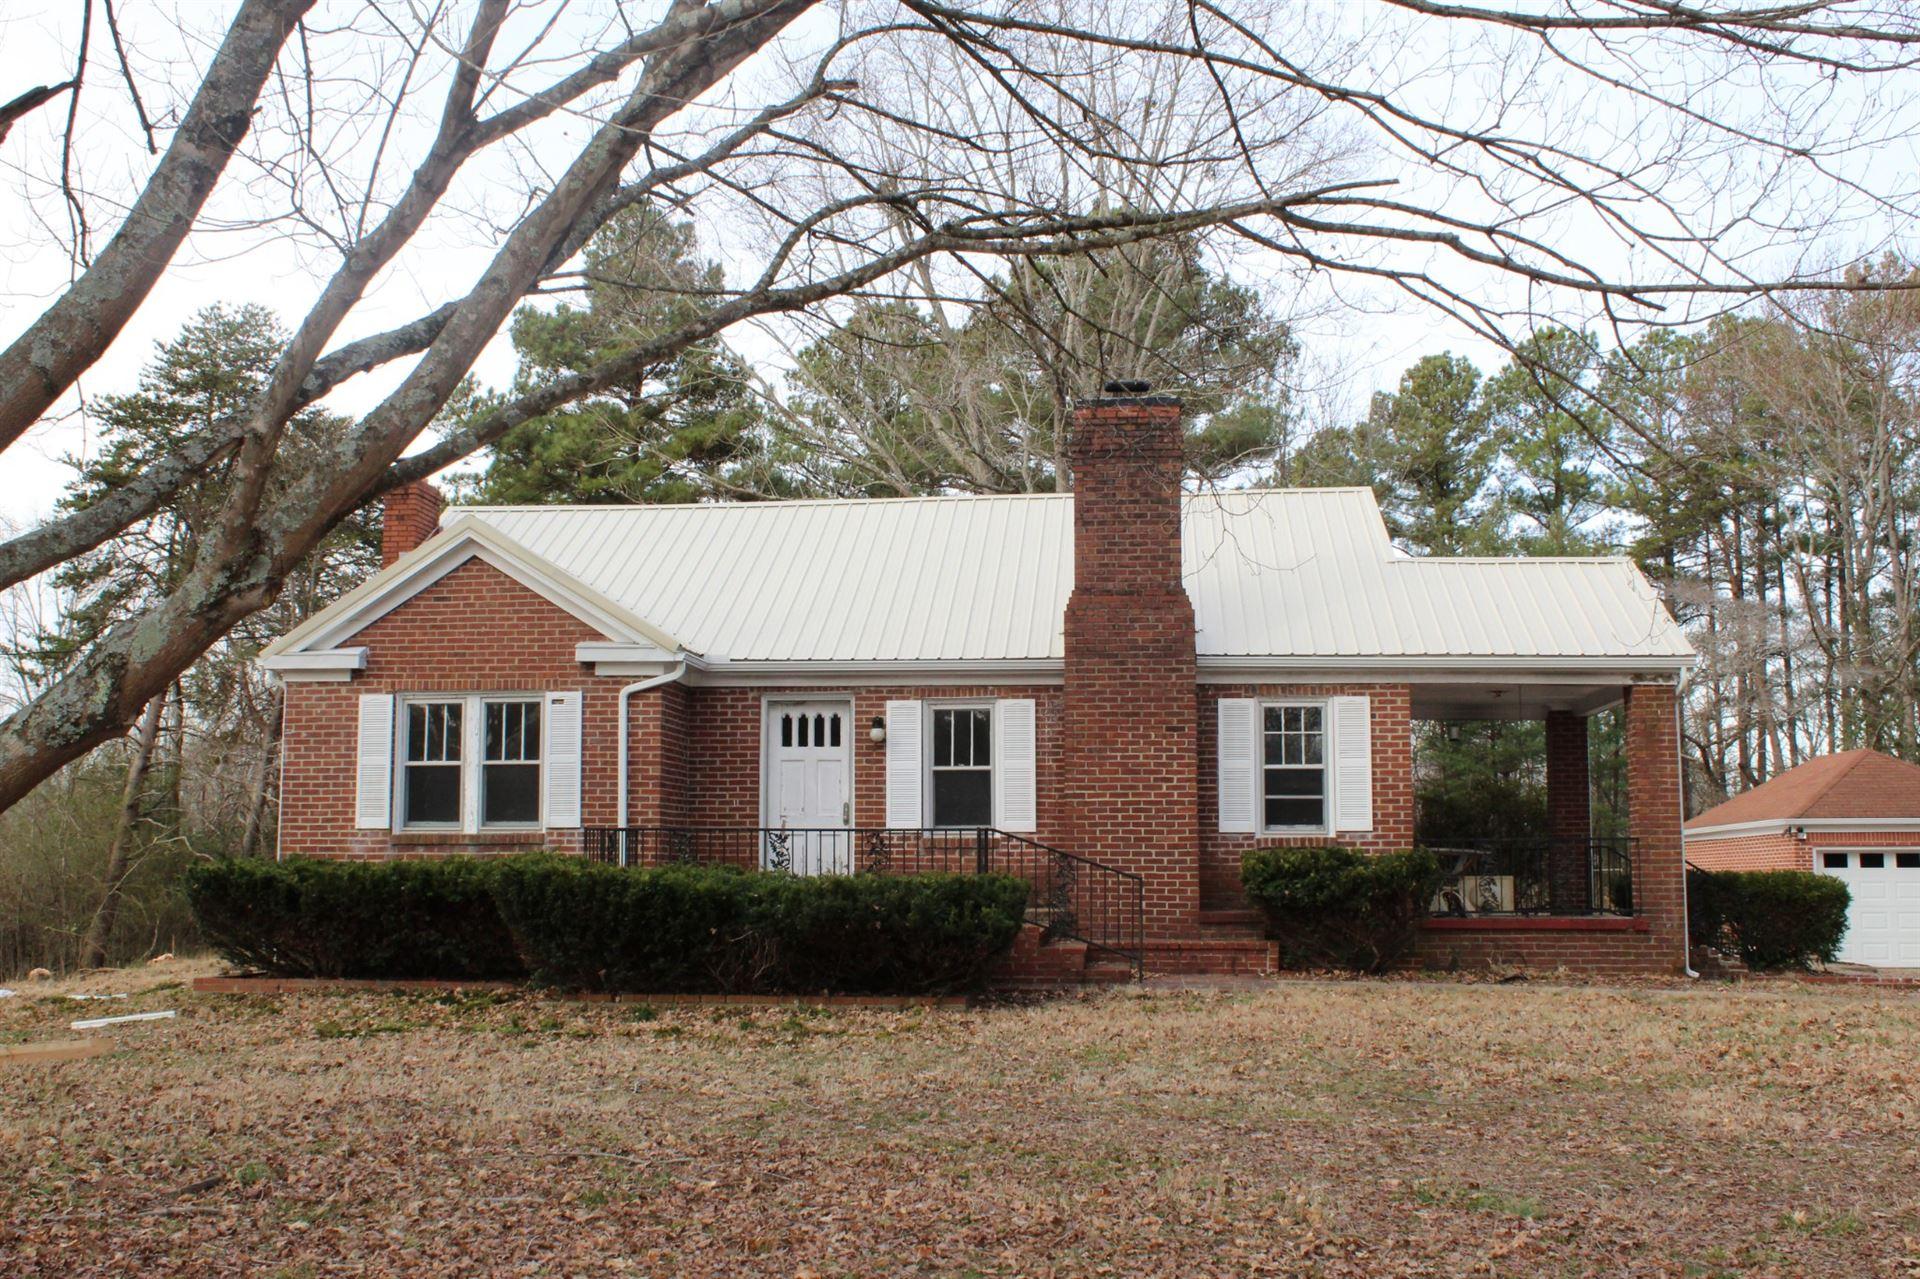 1260 Cumberland Heights Rd, Clarksville, TN 37040 - MLS#: 2182183